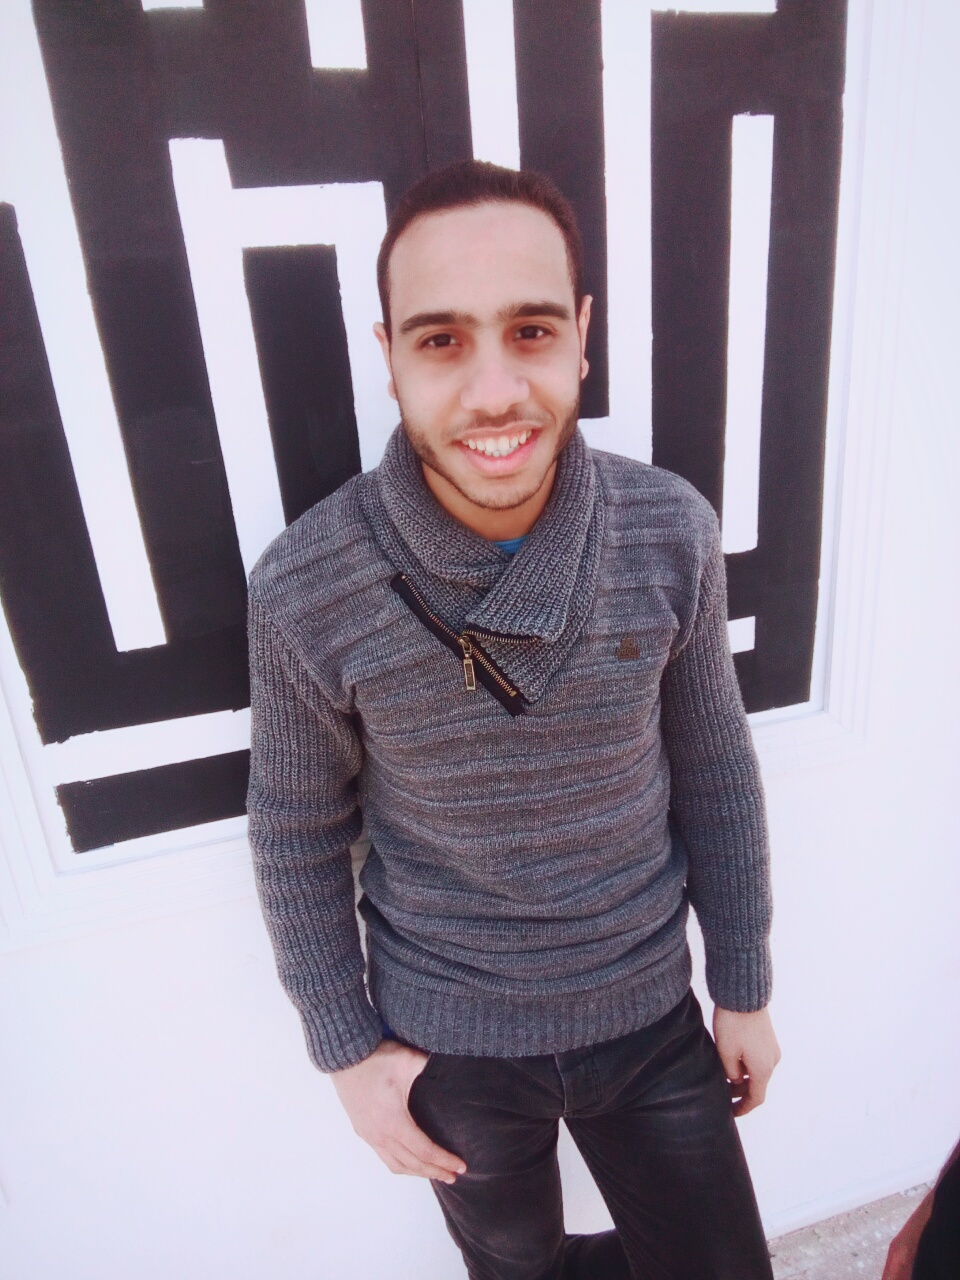 eslamfawy Profile Picture